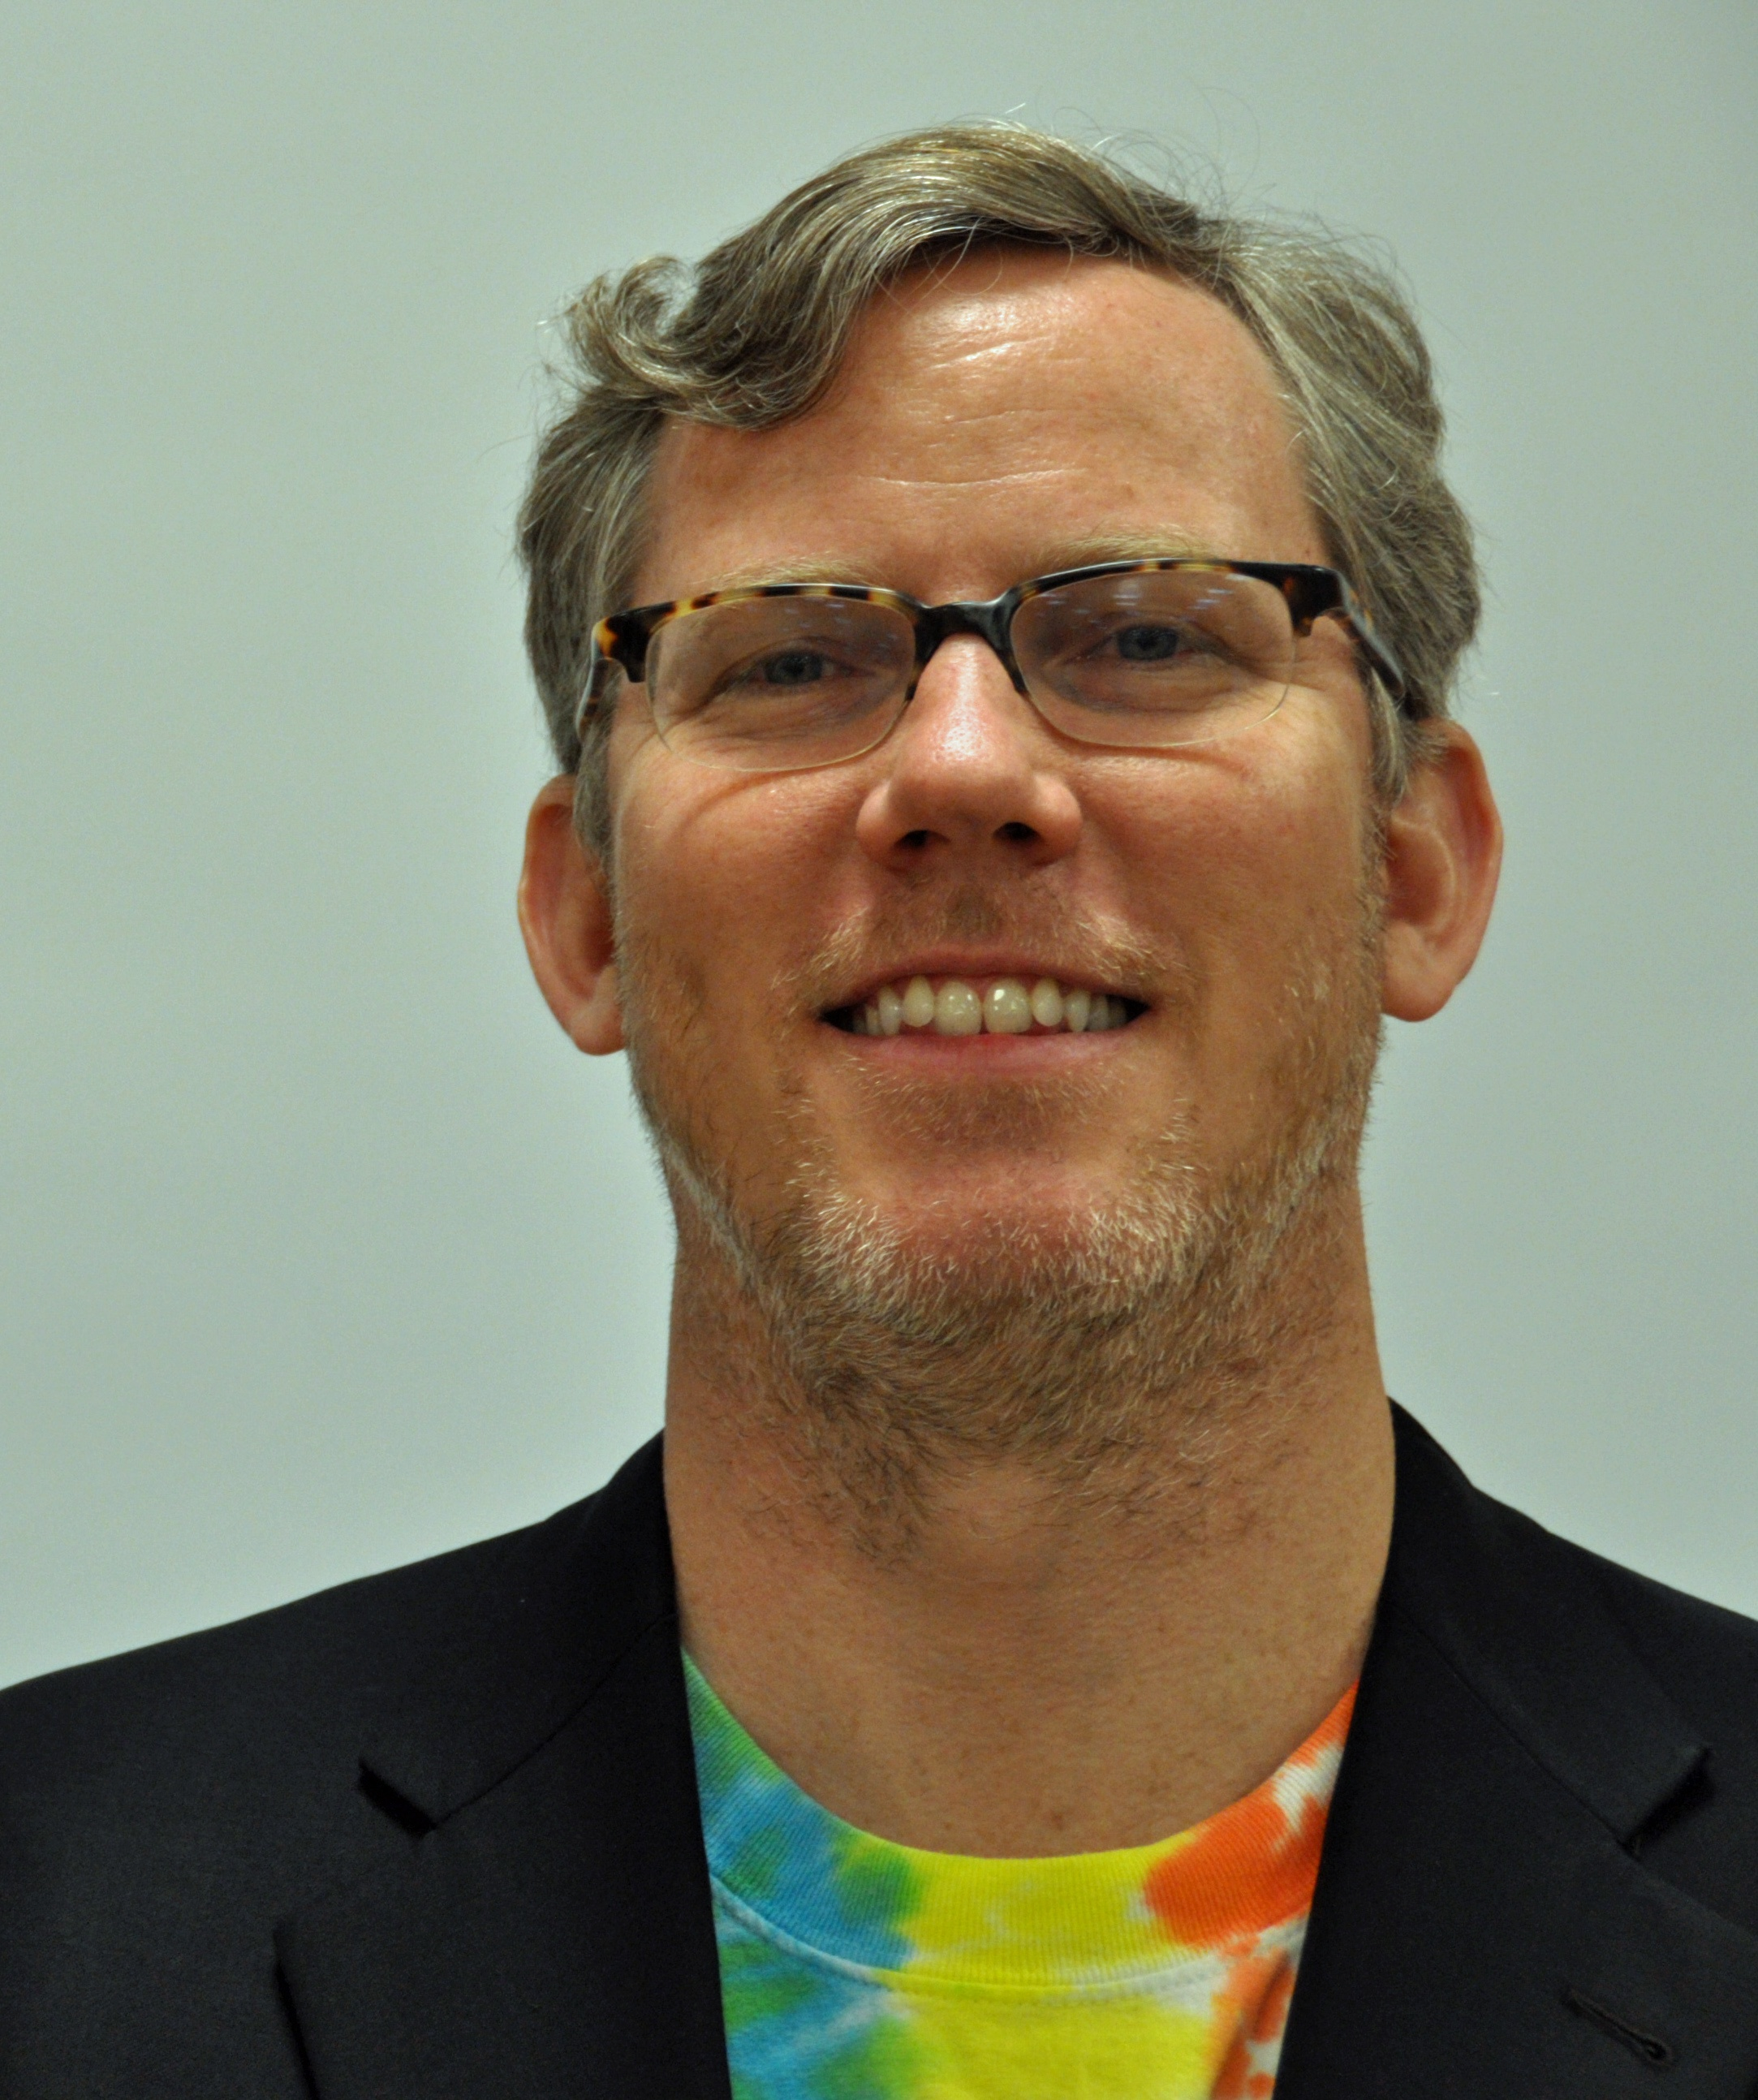 Brian Halligan, CEO of HubSpot